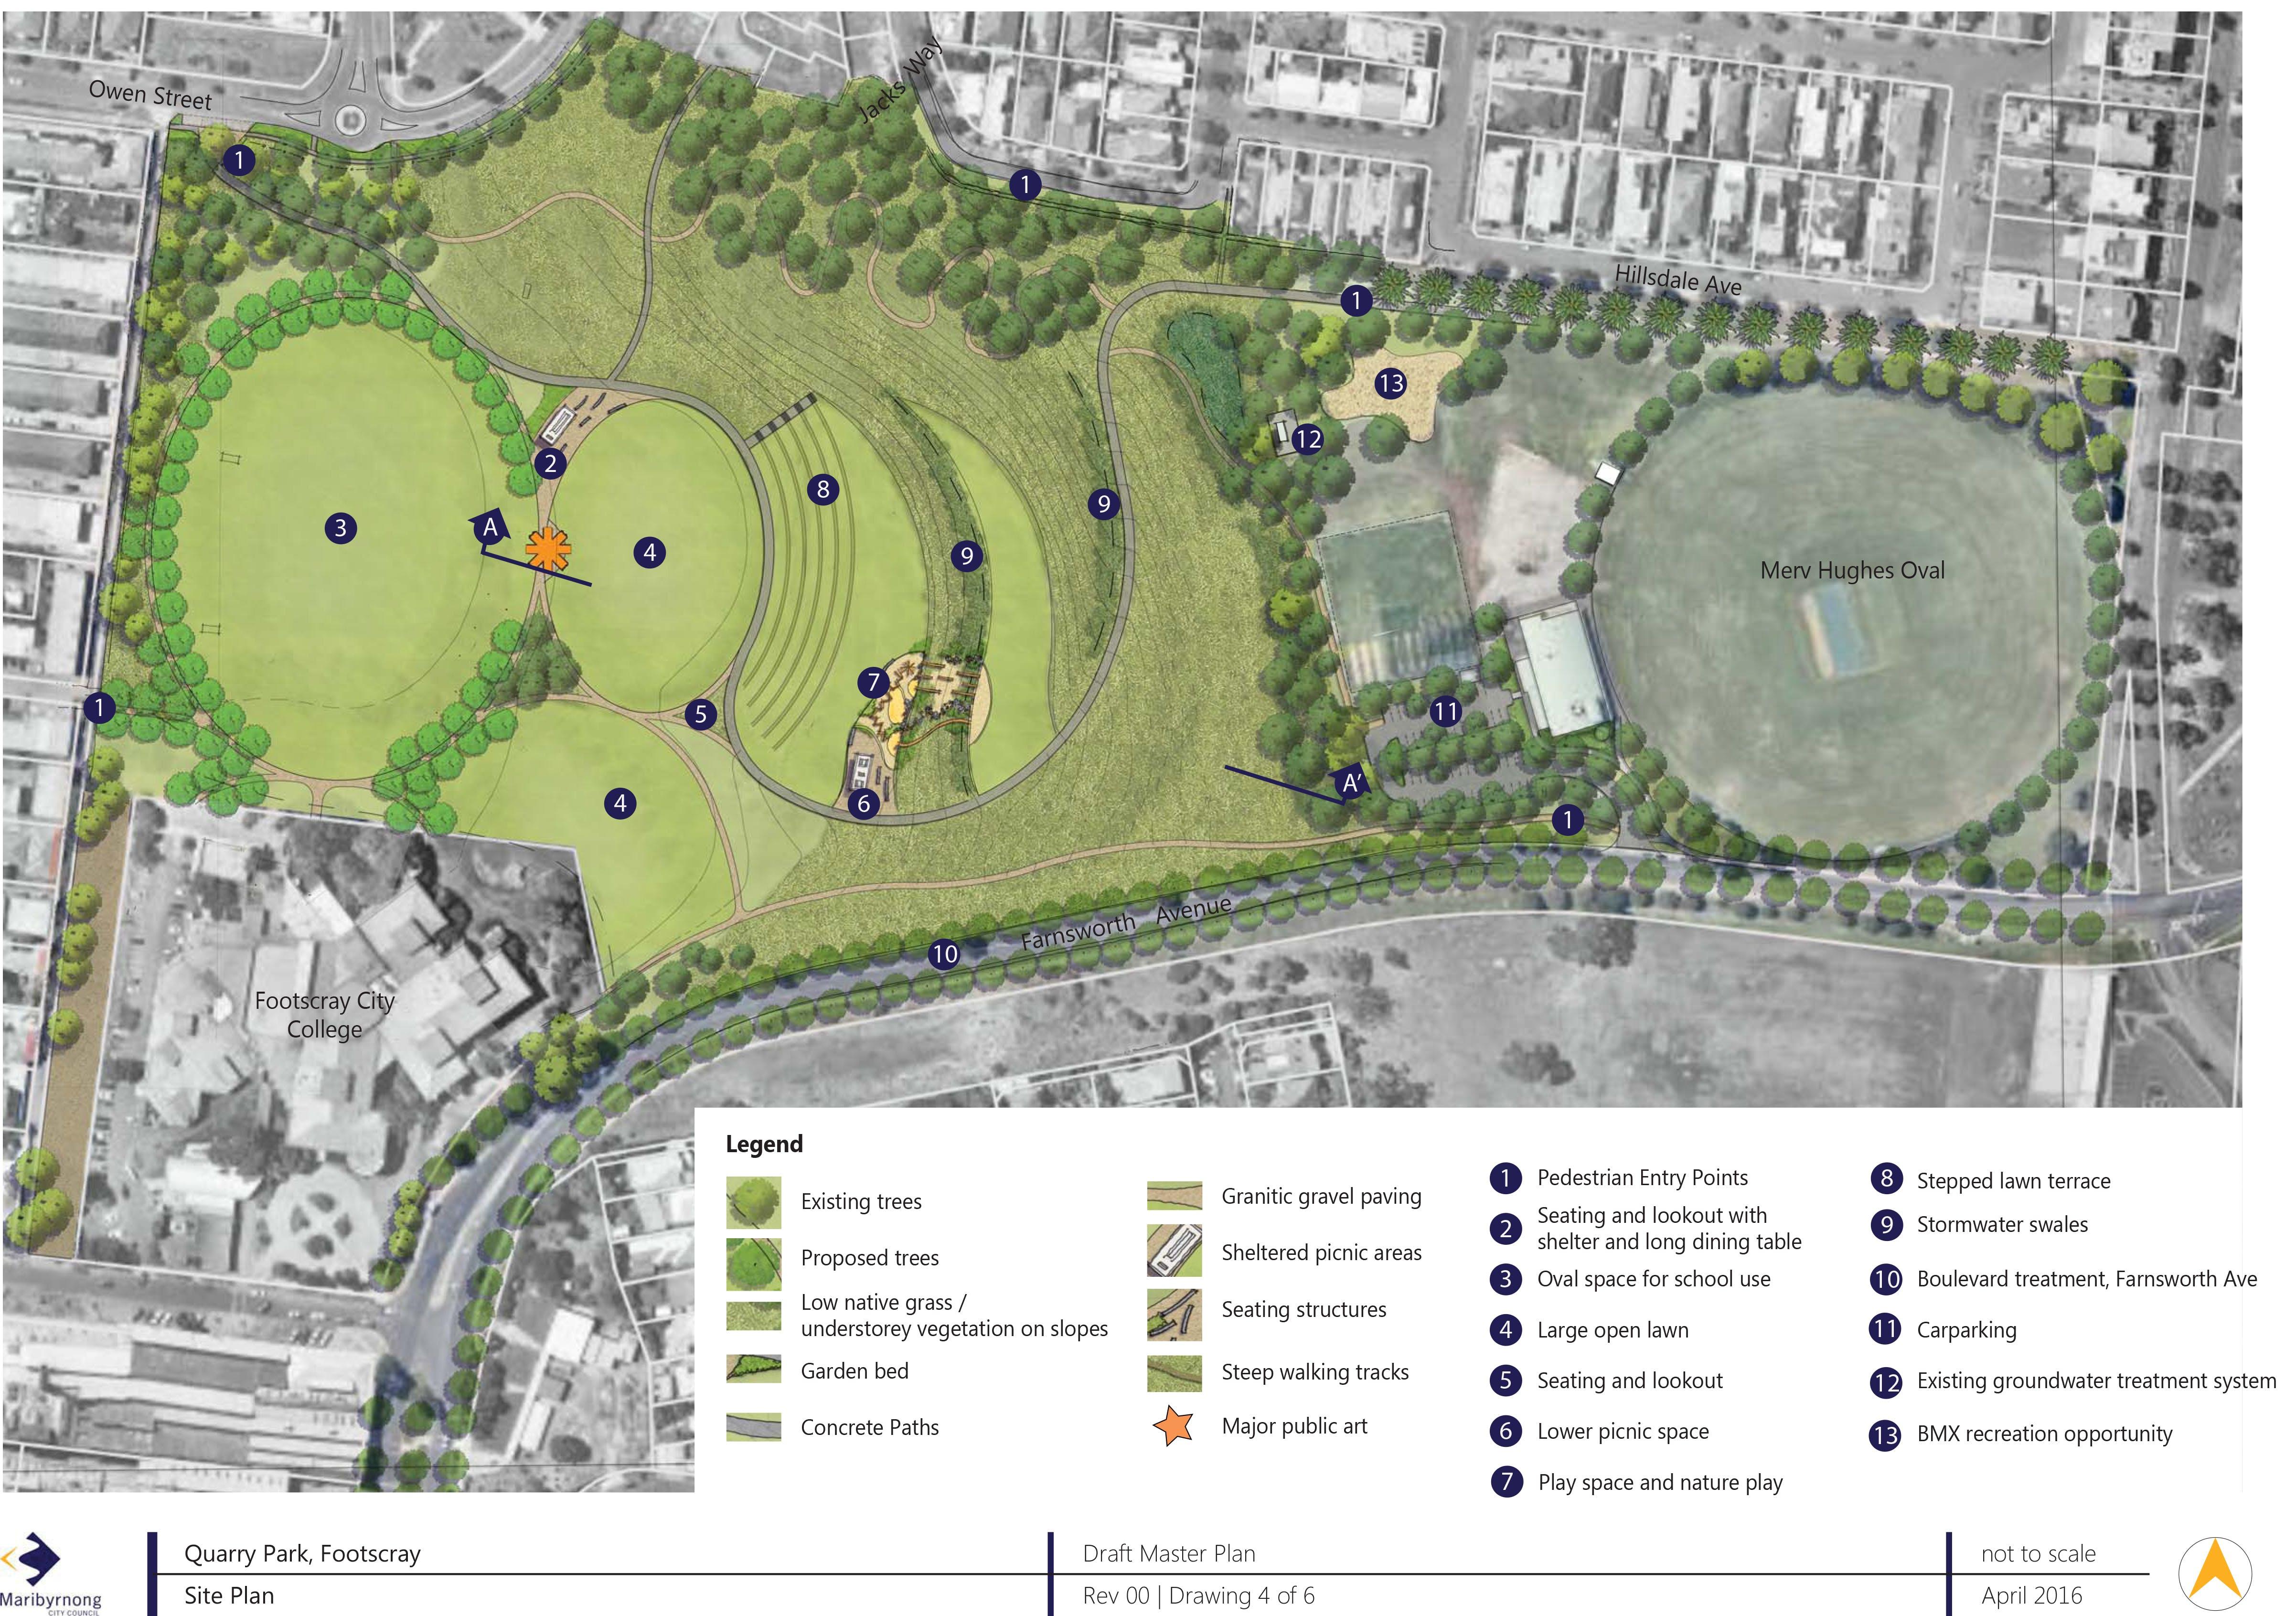 20160225   Quarry Park   Draft Master Plan  Main Plan